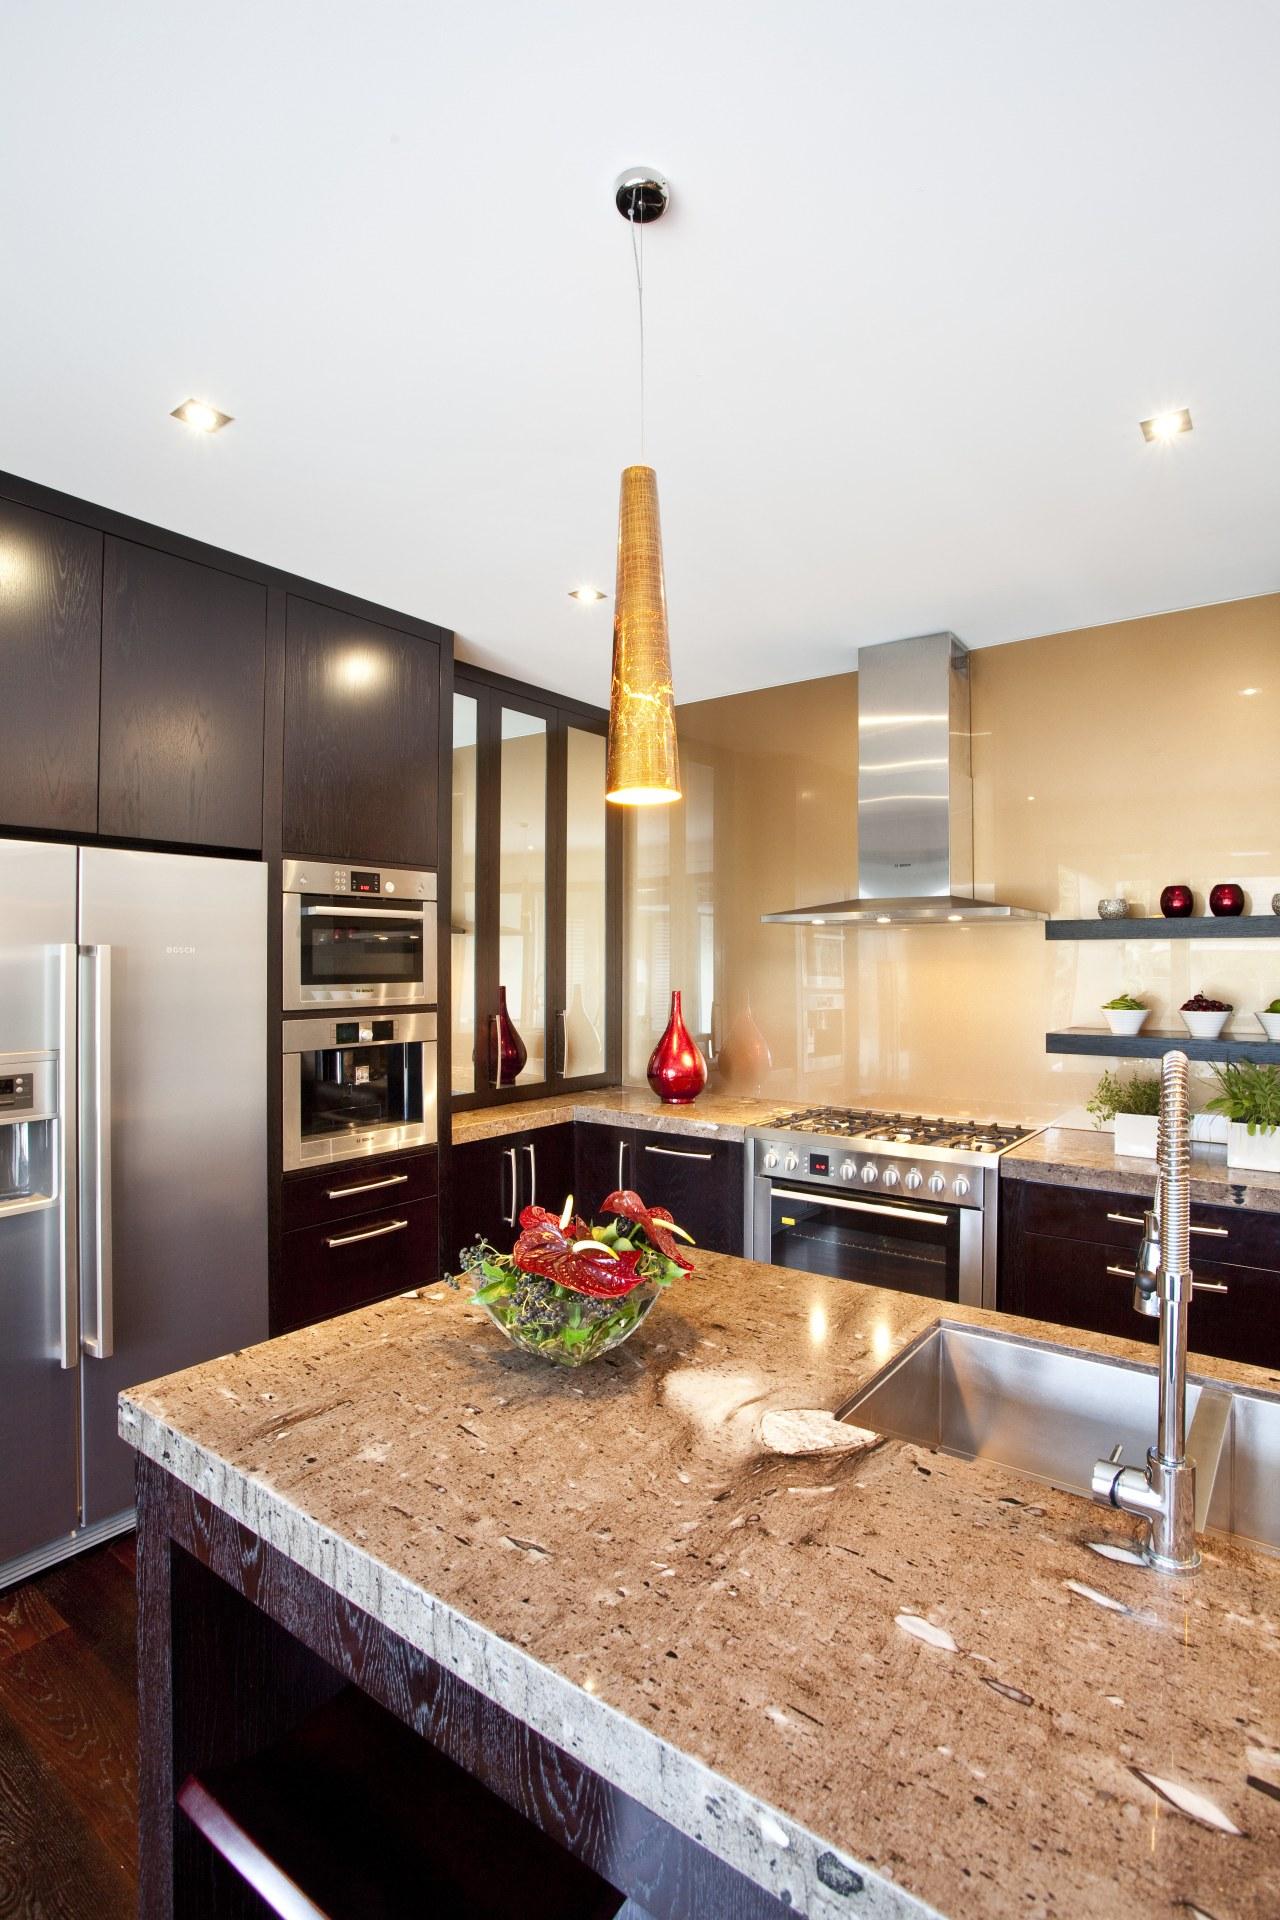 Balinese design influence. Dark-roasted American oak floorboards. Mousse countertop, interior design, kitchen, real estate, white